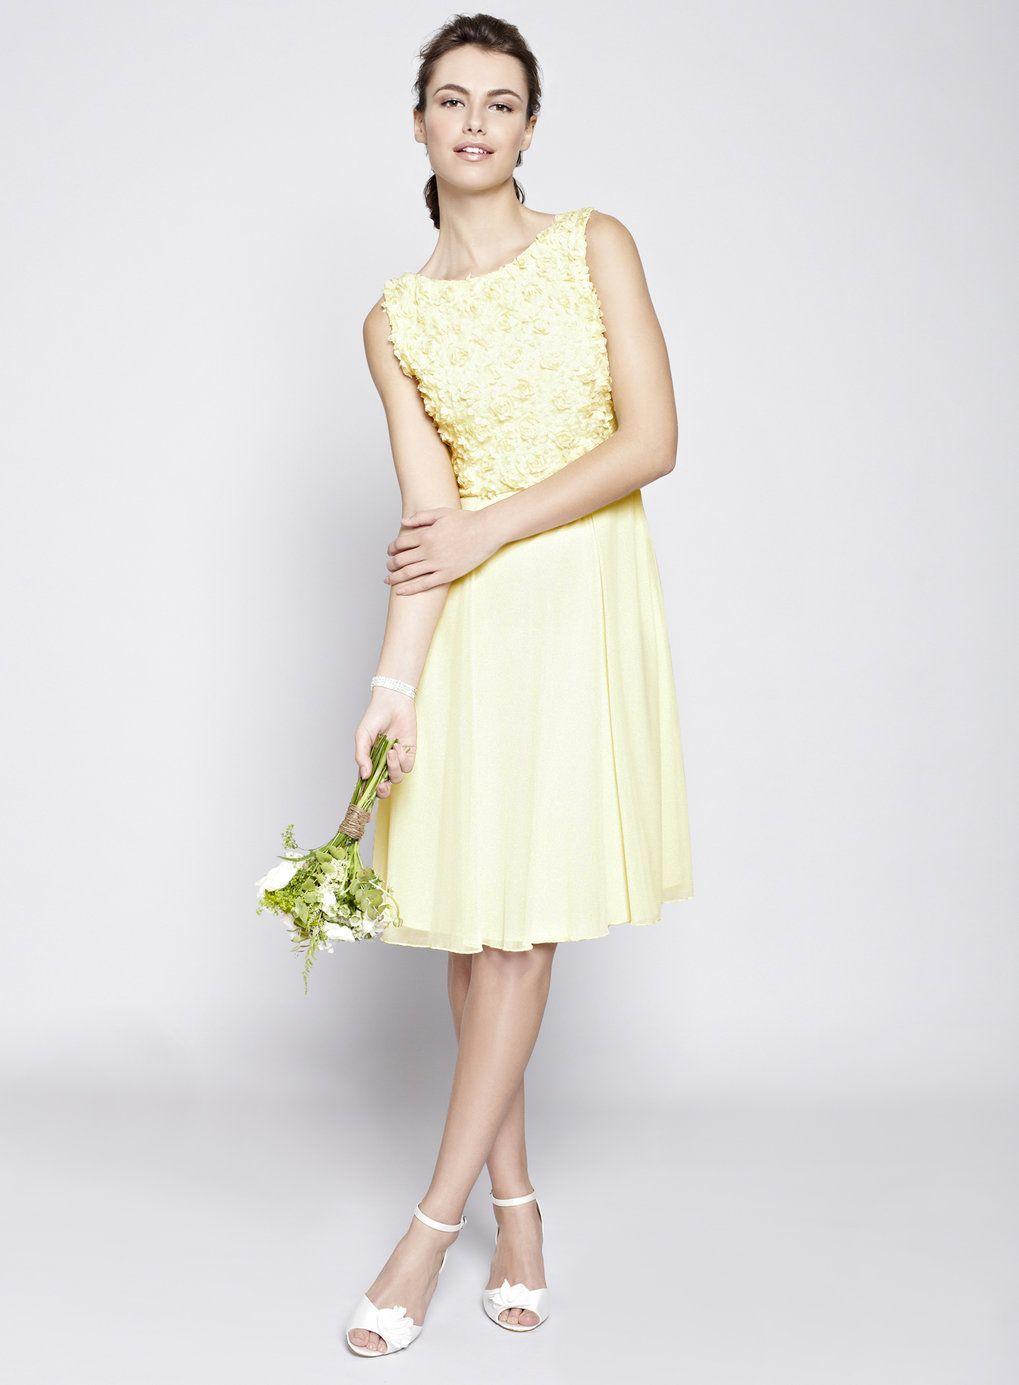 Lemon rosie short bridesmaid dress bridesmaids dresses pinterest lemon rosie short bridesmaid dress ombrellifo Images